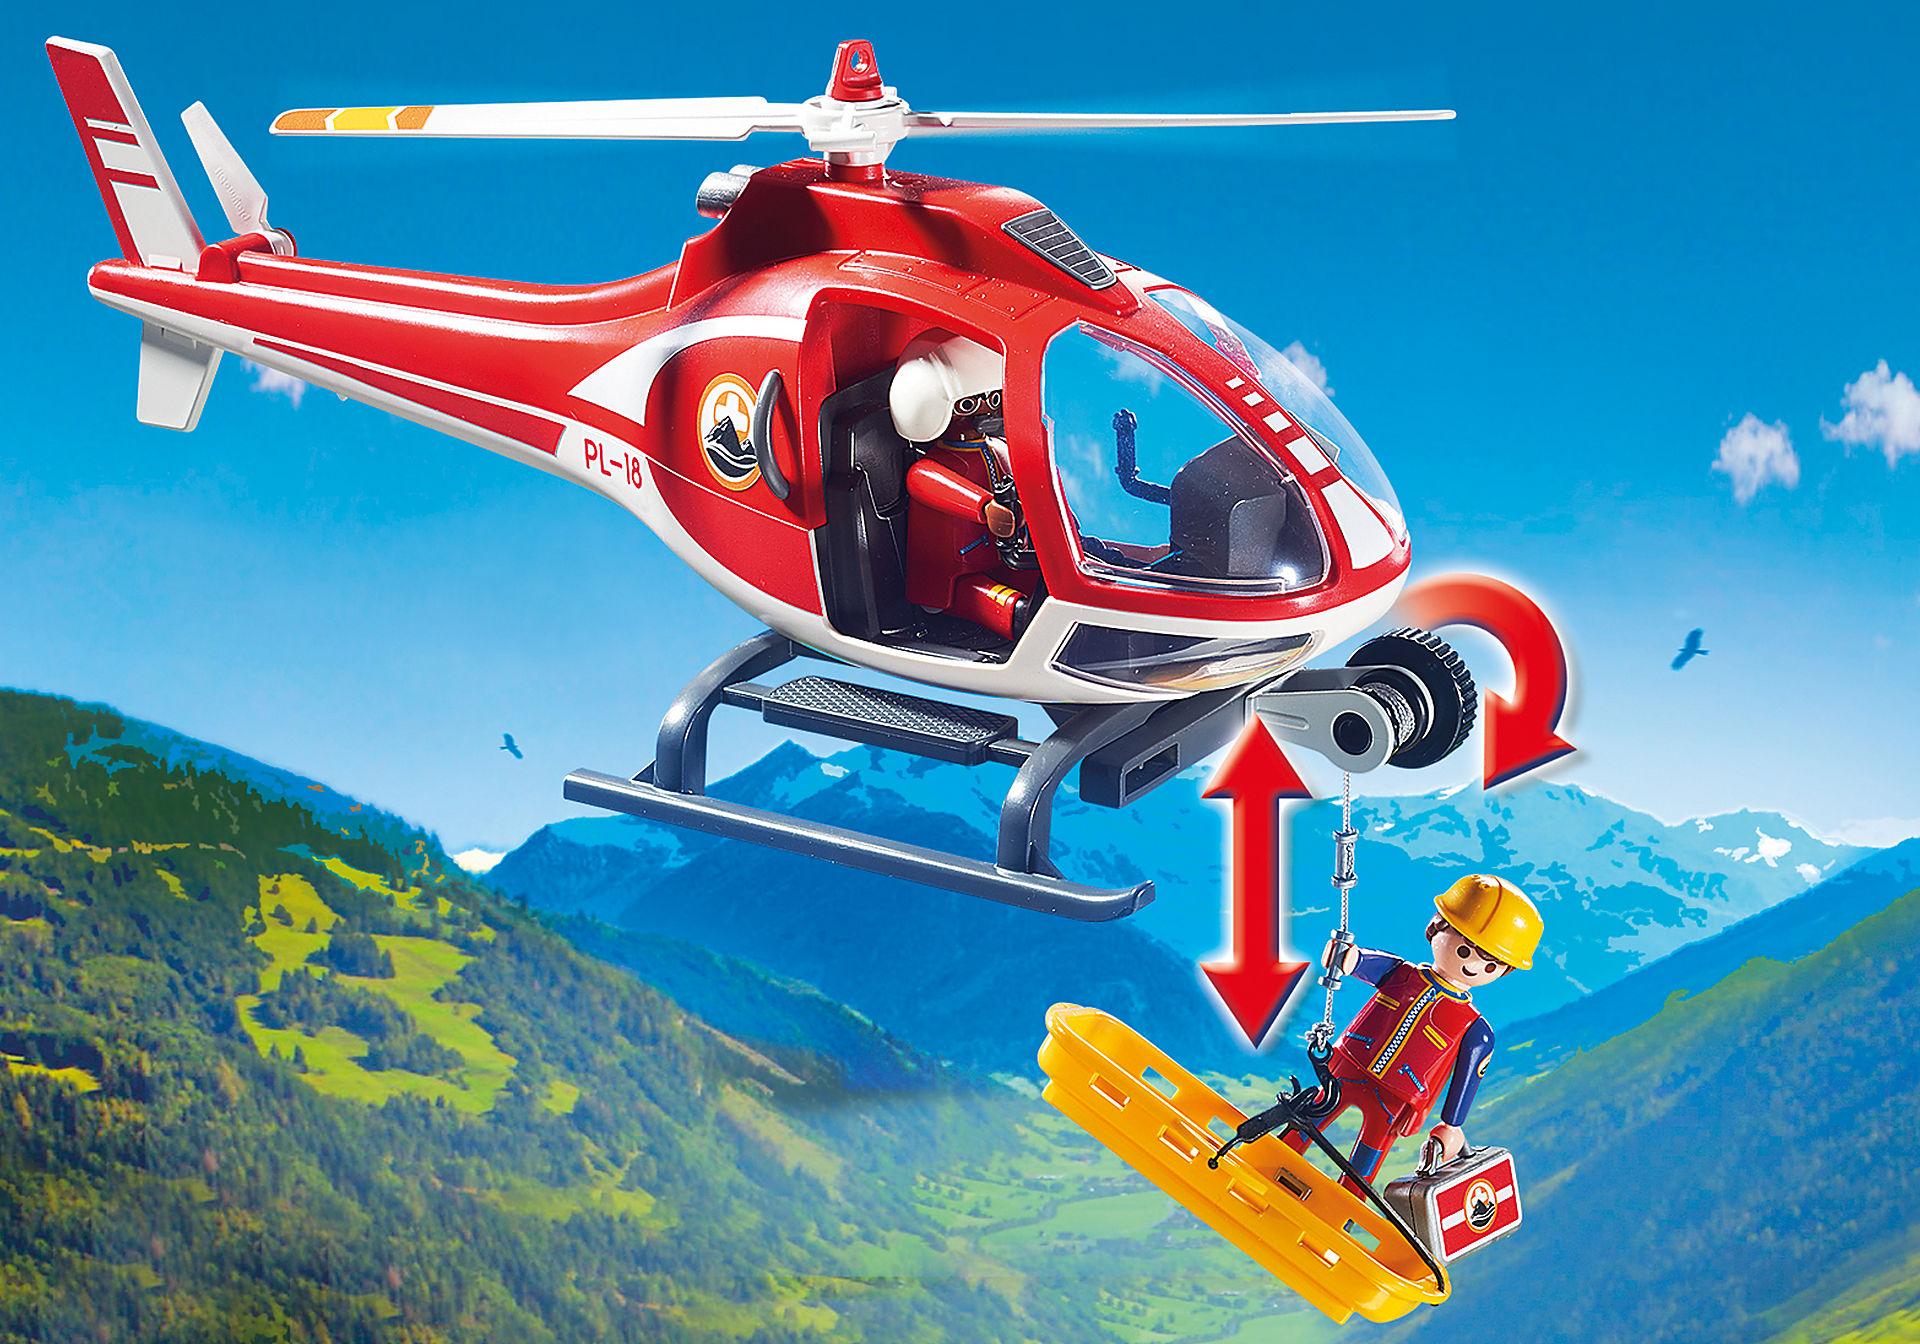 http://media.playmobil.com/i/playmobil/9127_product_extra1/Reddingswerkers met helikopter